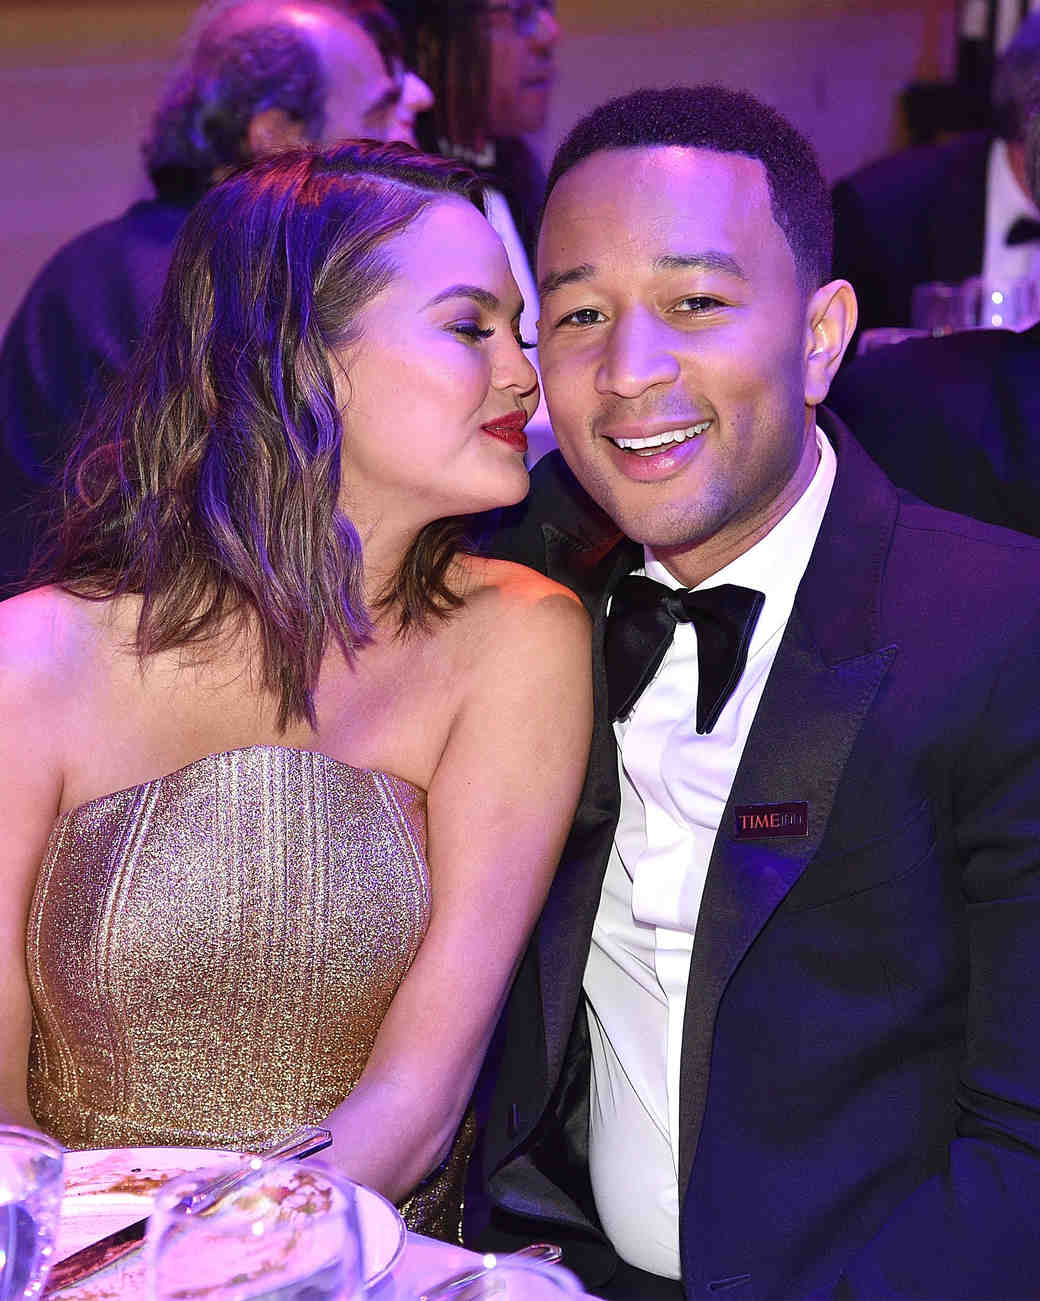 John Legend and Chrissy Teigen Time 100 Gala